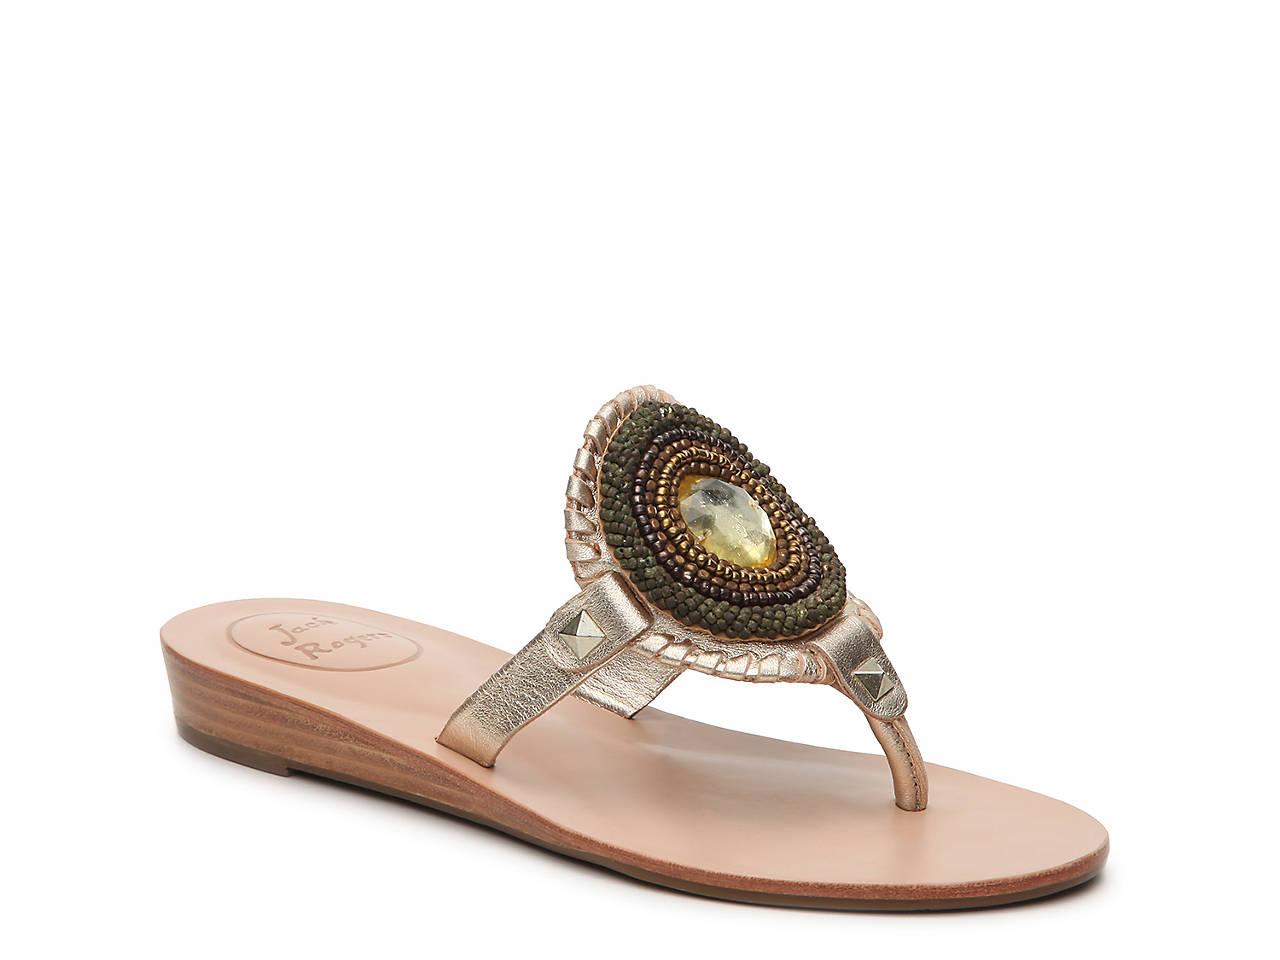 118dae7c775f Jack Rogers Gisele Flat Sandal Women s Shoes